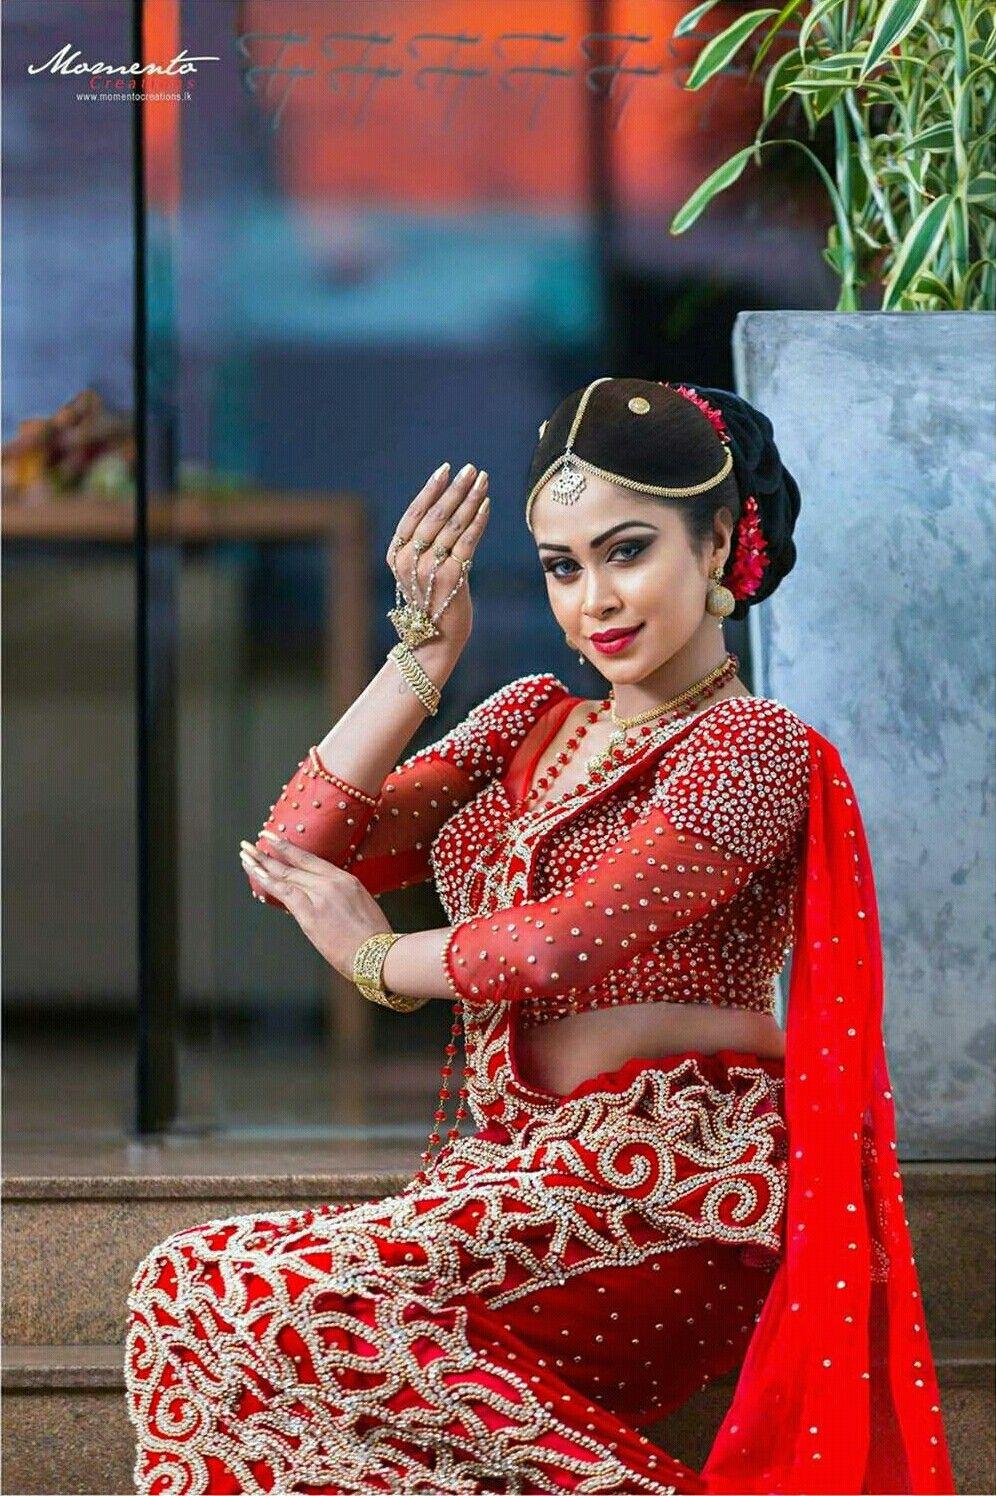 Pin by Yashodara Rathnathilaka on 2nd day Brides ...